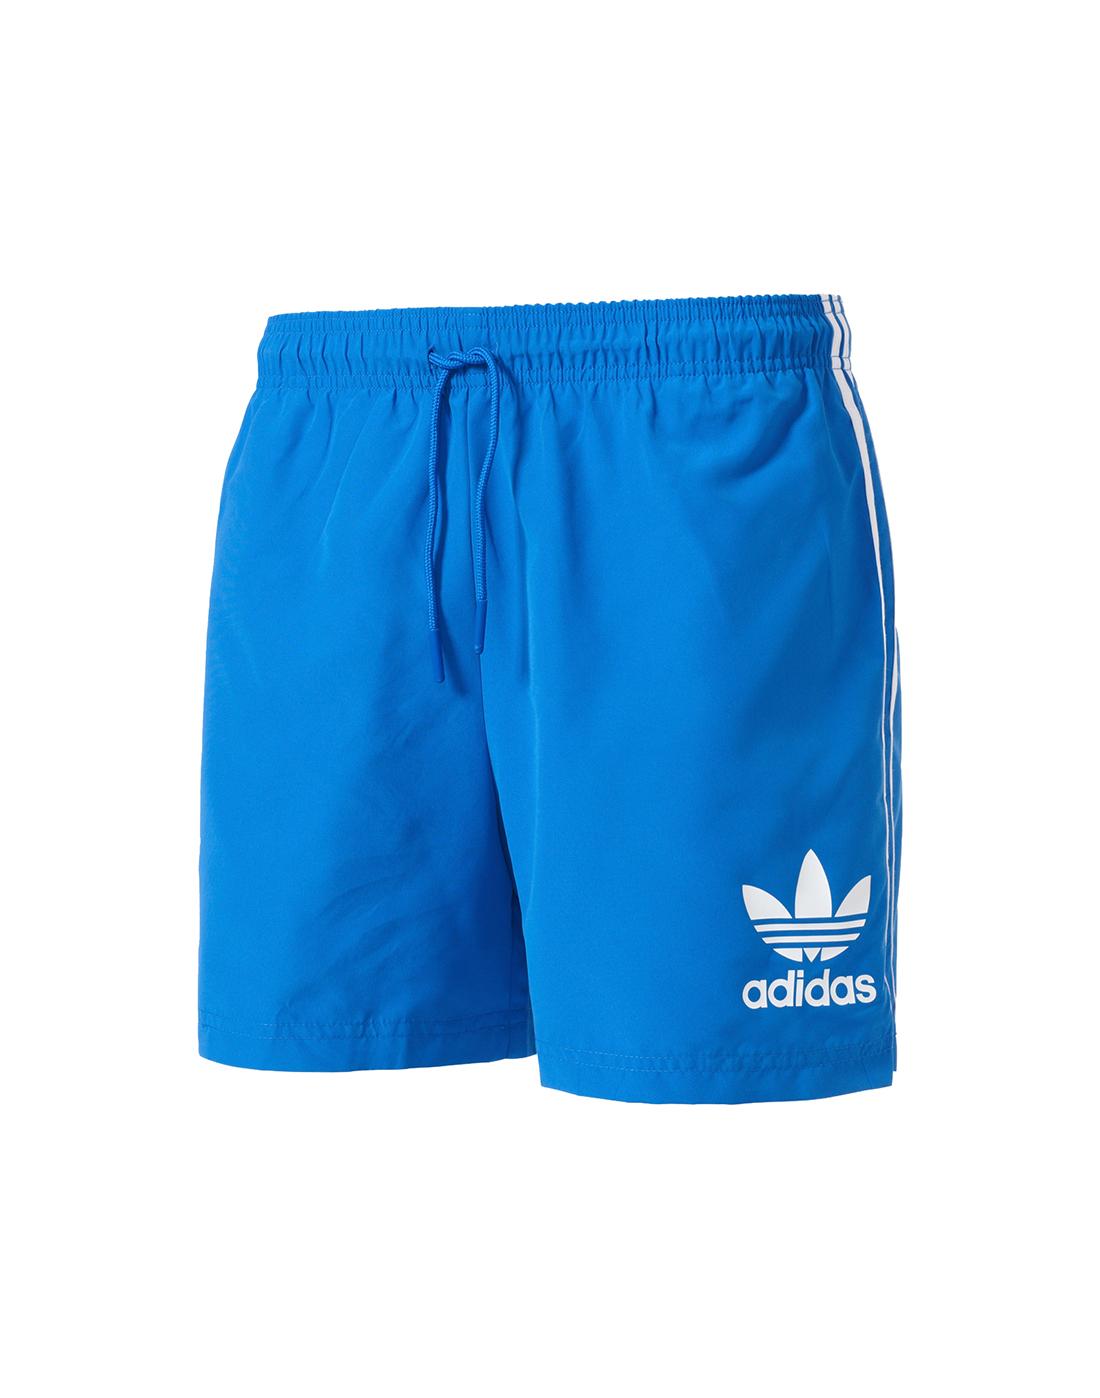 5cb16f97c8 adidas Originals. Mens California Short. Mens California Short ...